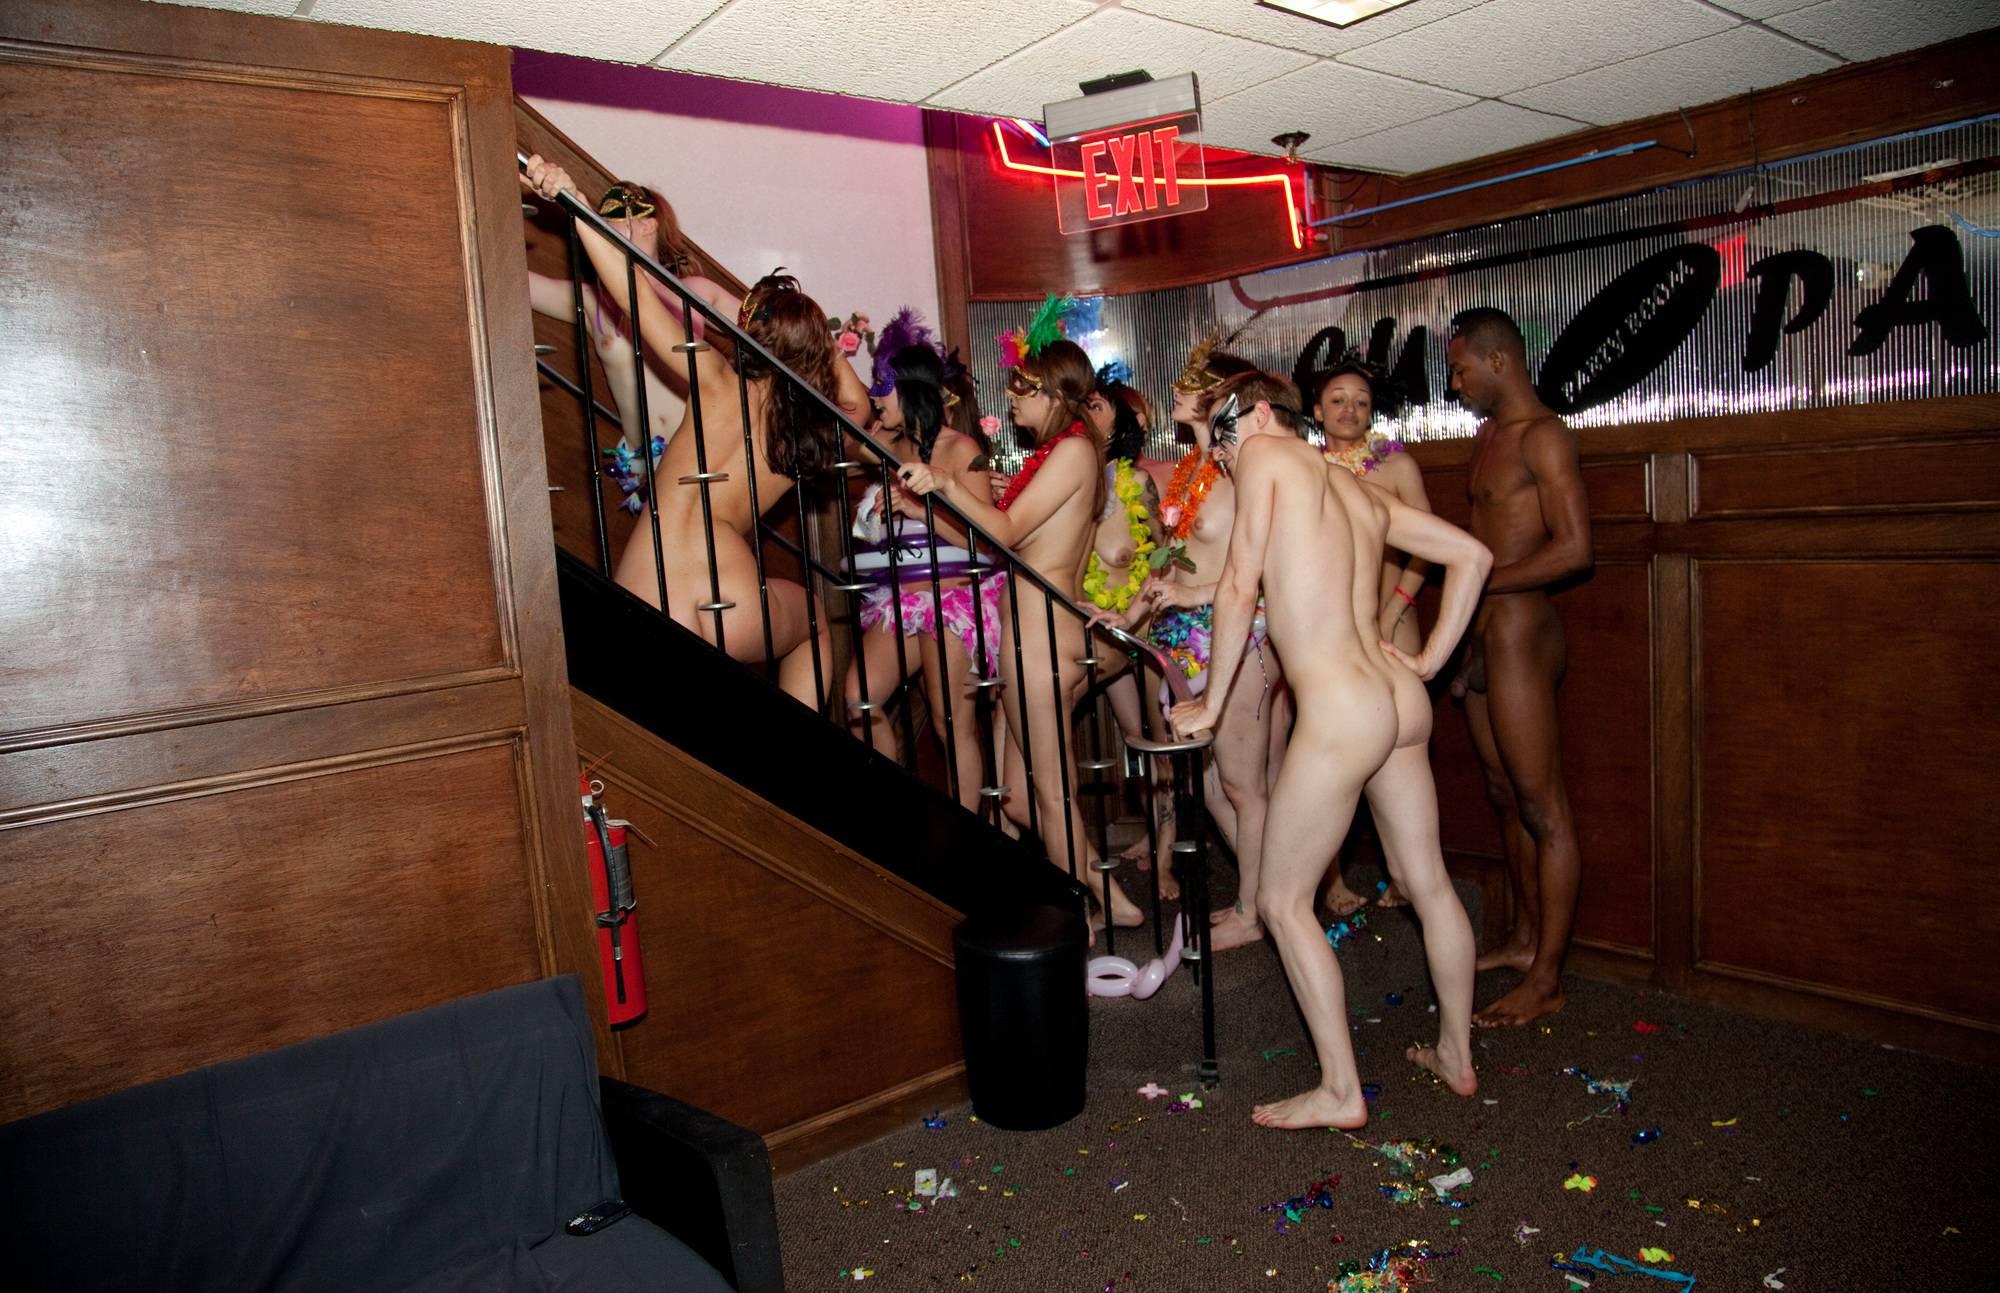 Pure Nudism Photos-Masquerade Stairs Galore - 2